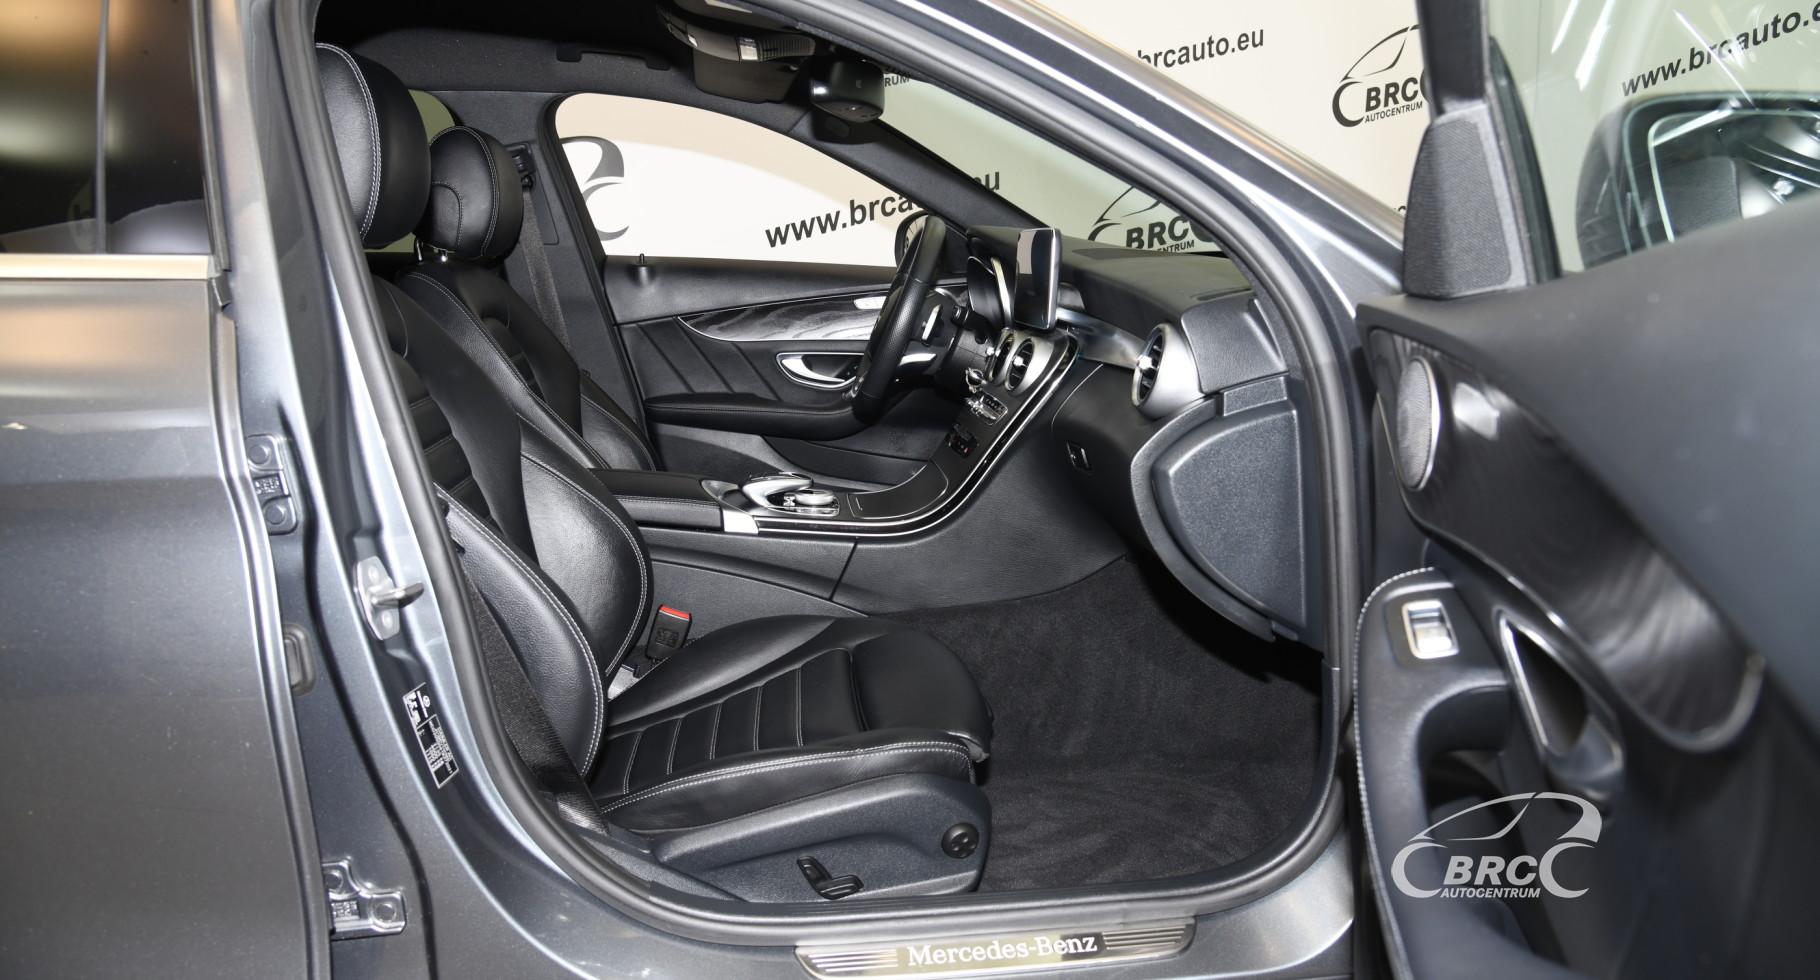 Mercedes-Benz C 220 CDI Automatas